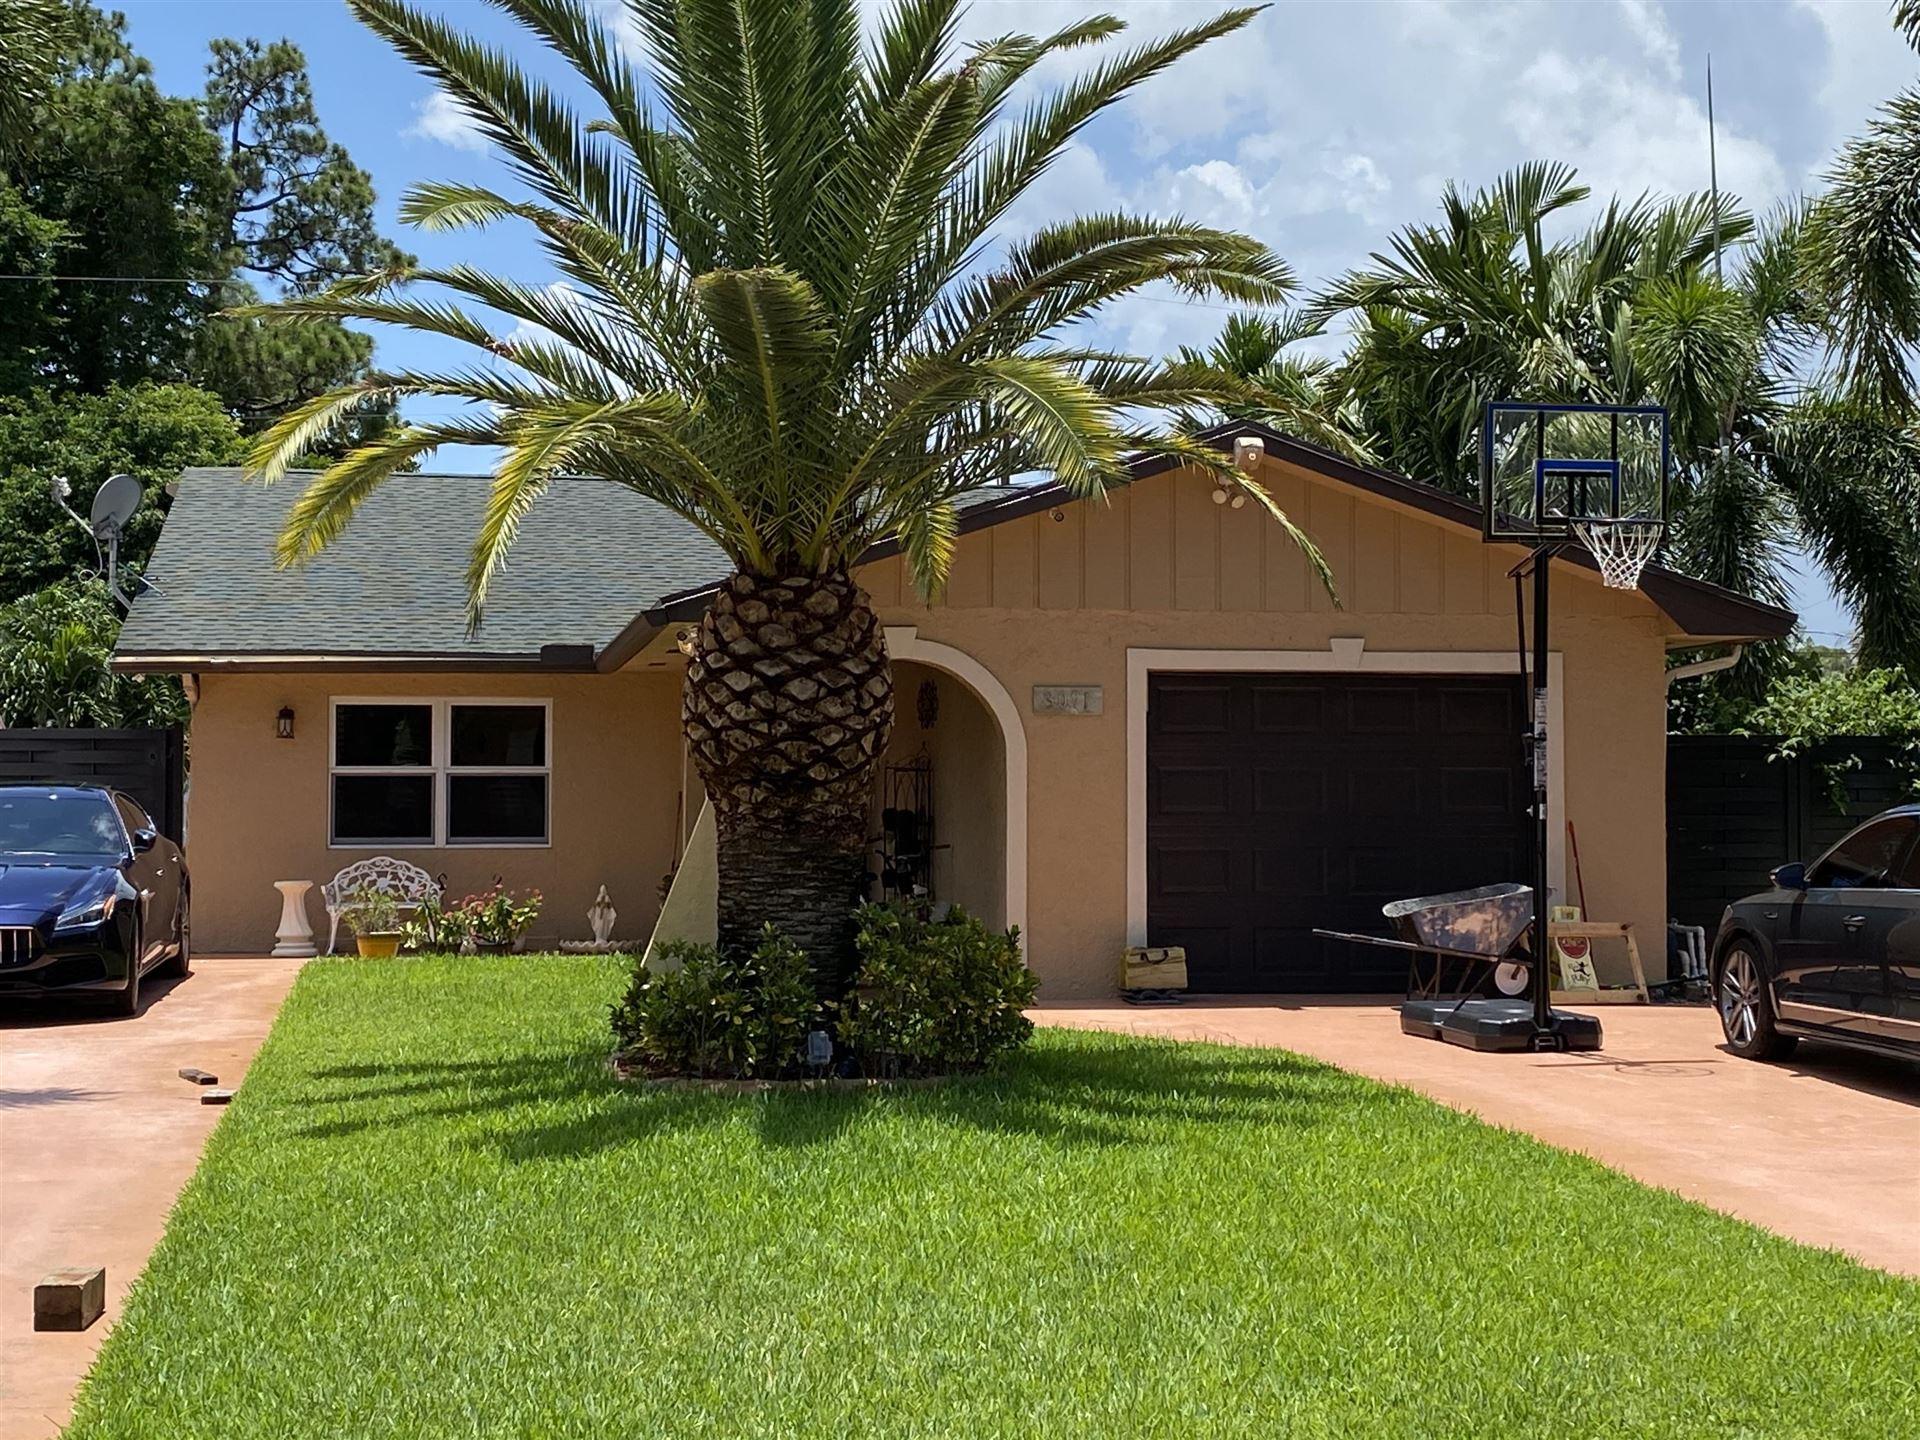 3091 Broward Ave Avenue, Greenacres, FL 33463 - MLS#: RX-10723397